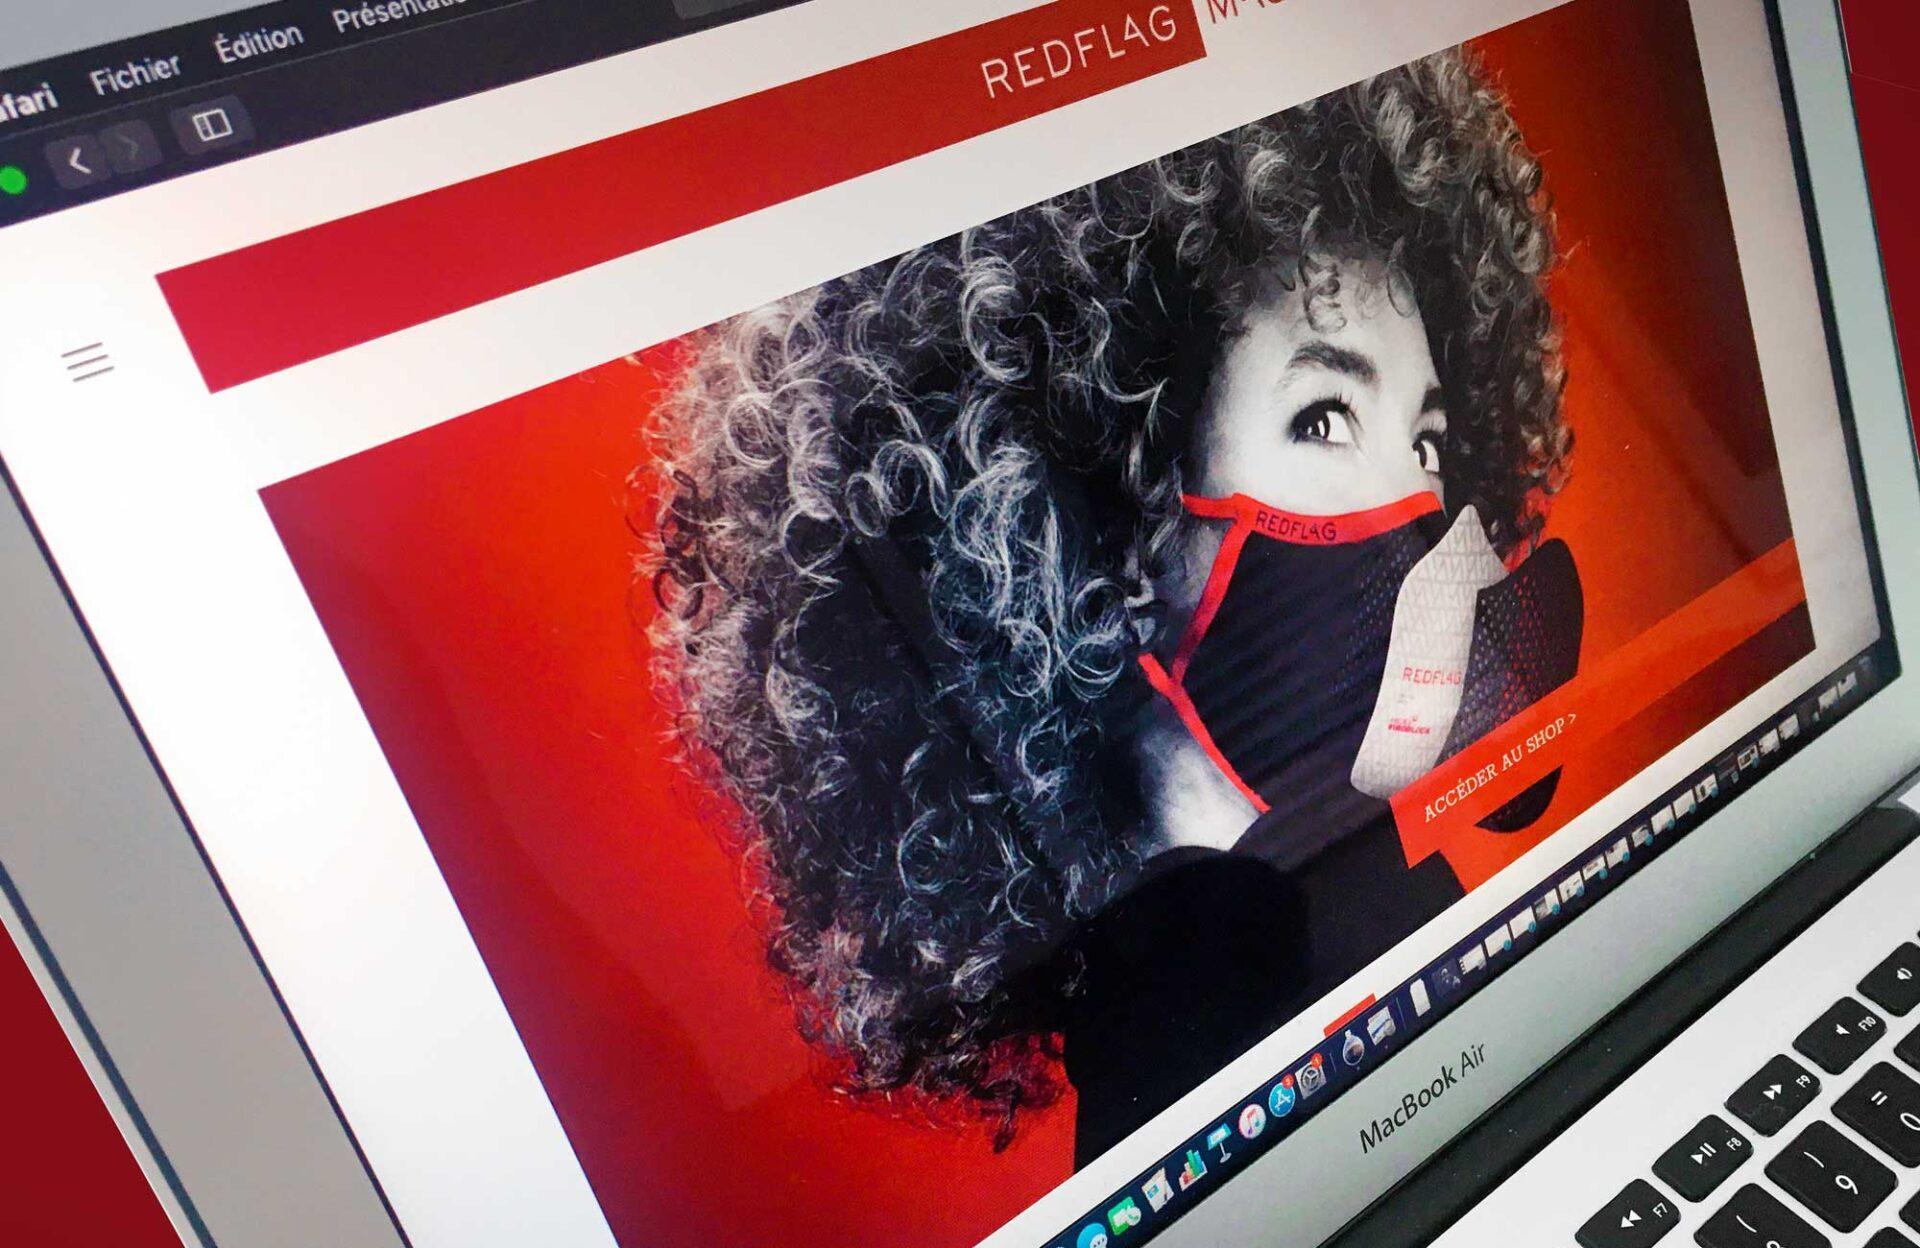 Brand_RedflagMask_©loup.ch_1